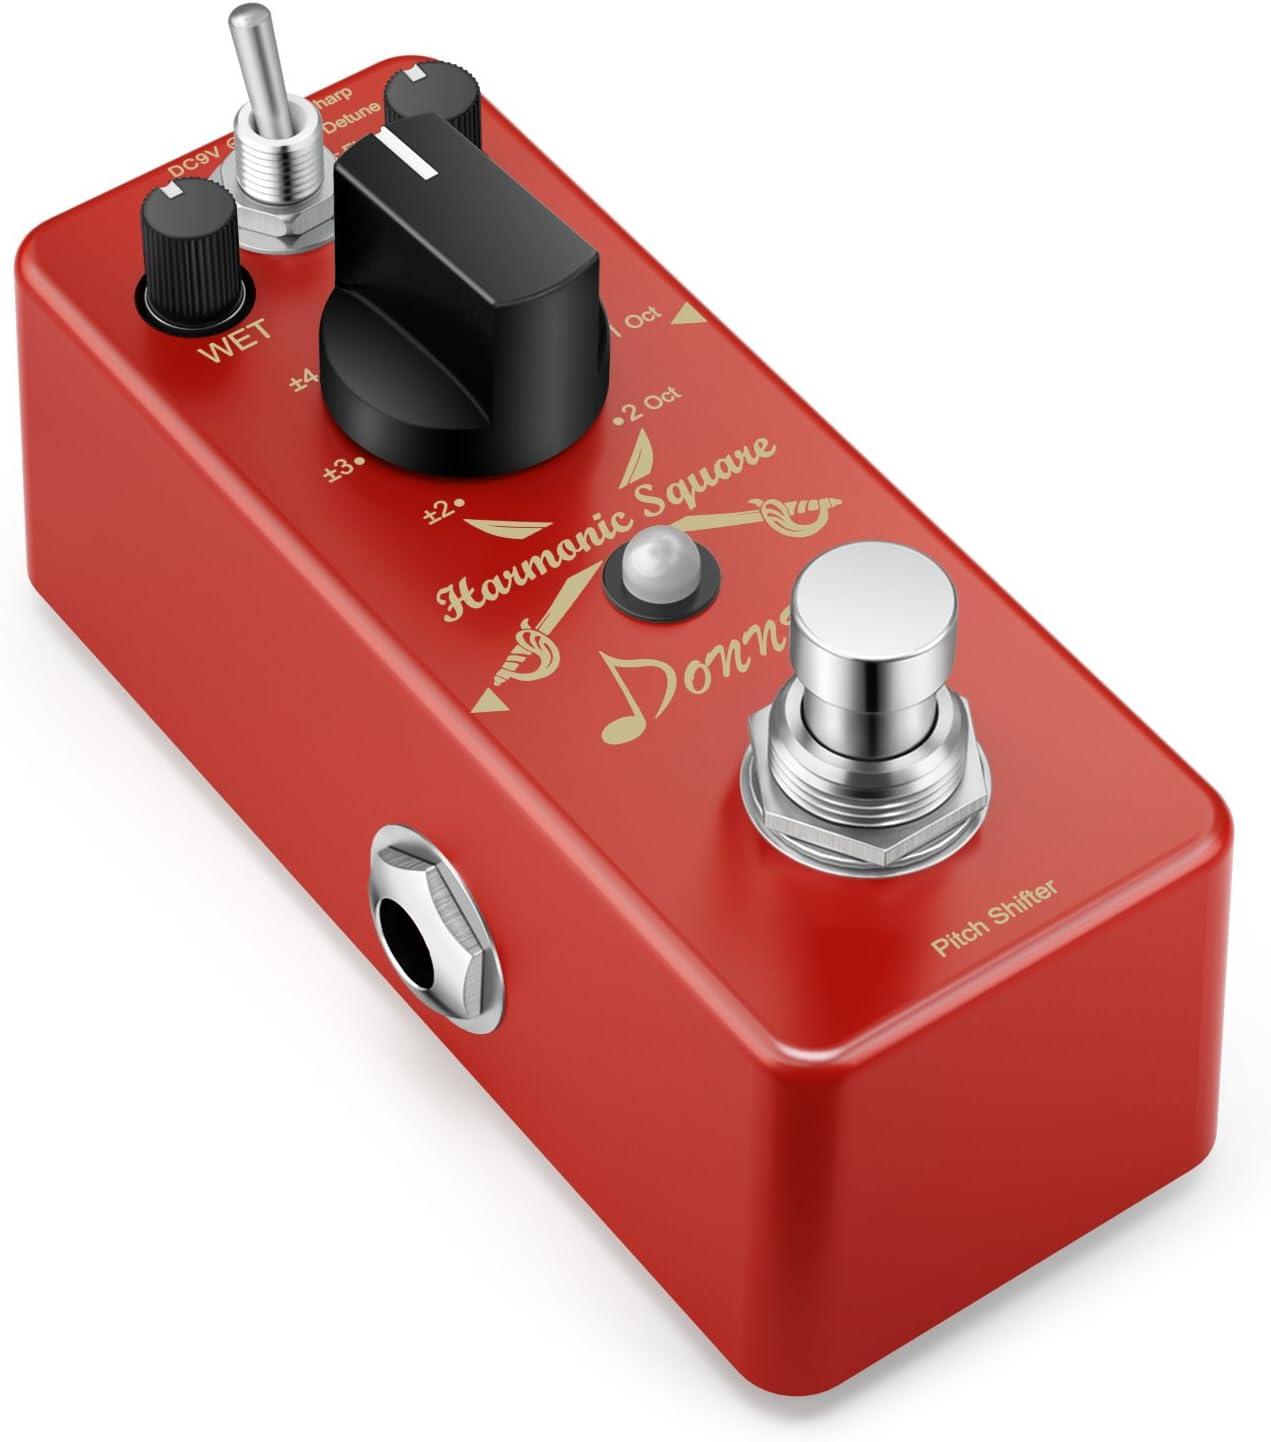 Donner Octave Pedal de Guitarra - 7 Modos, Digital Harmonic Square, Pedal Efectos de Guitarra